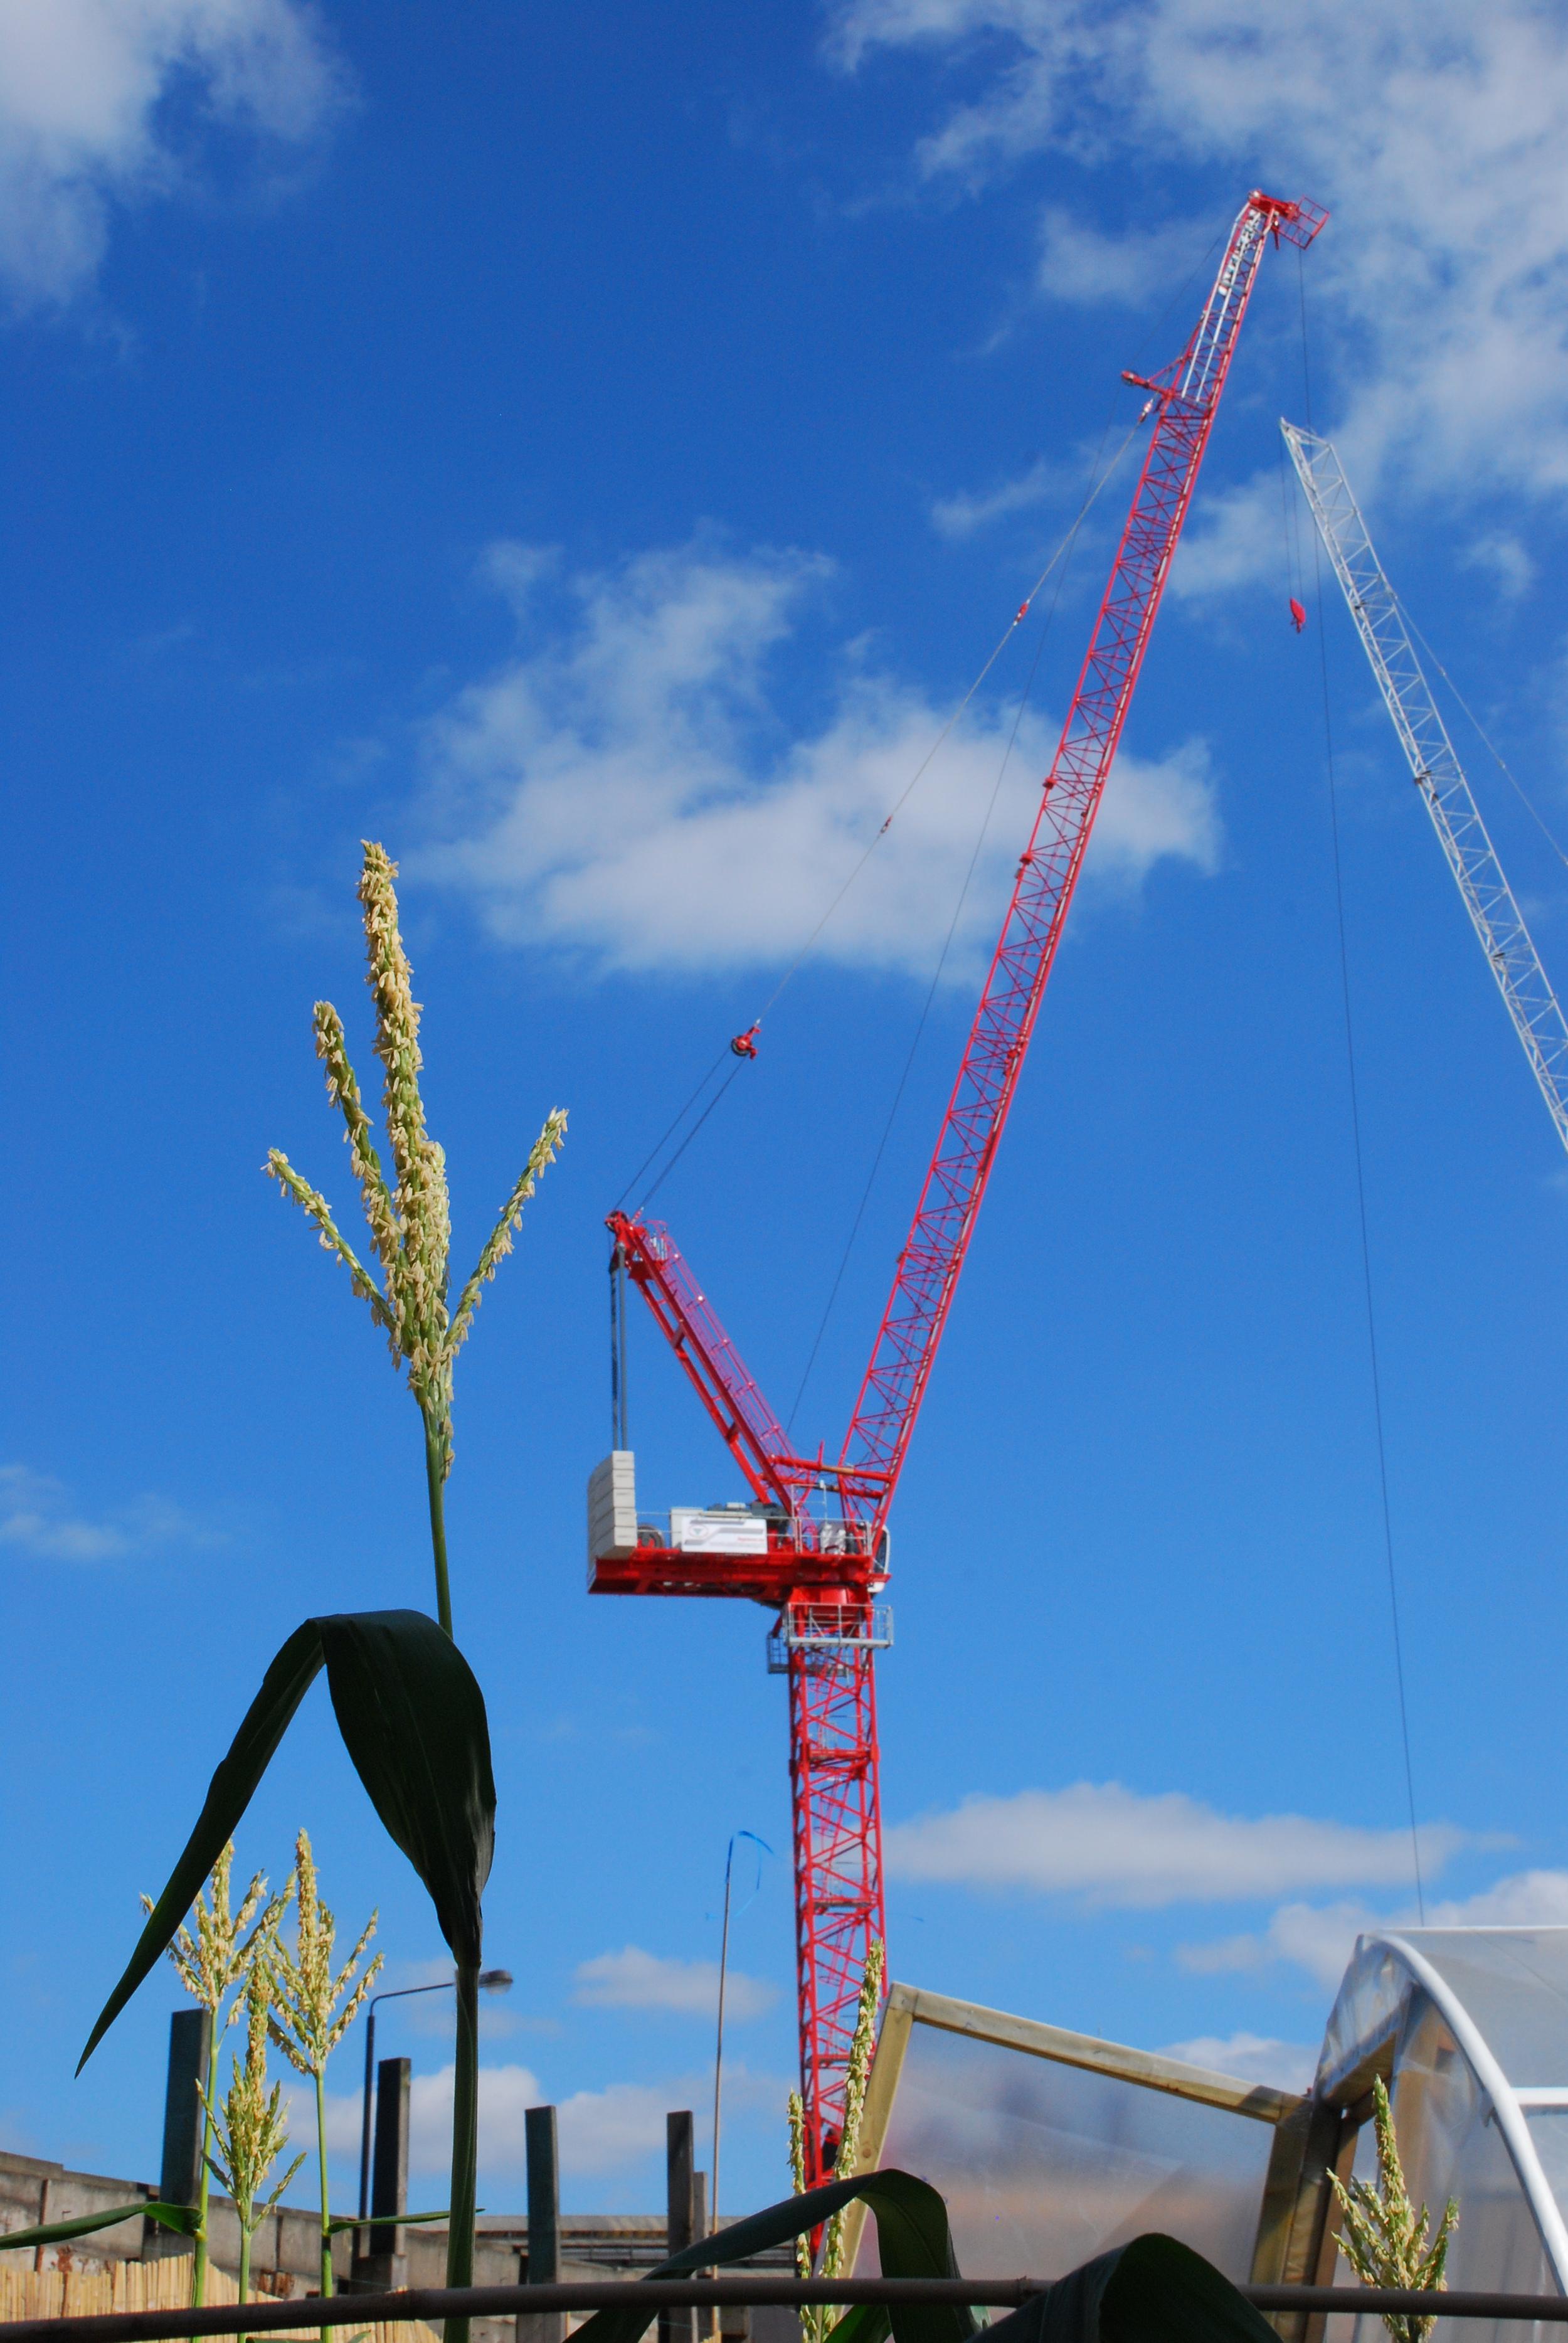 Crane-and-Grain-Photo-IC-Works.JPG